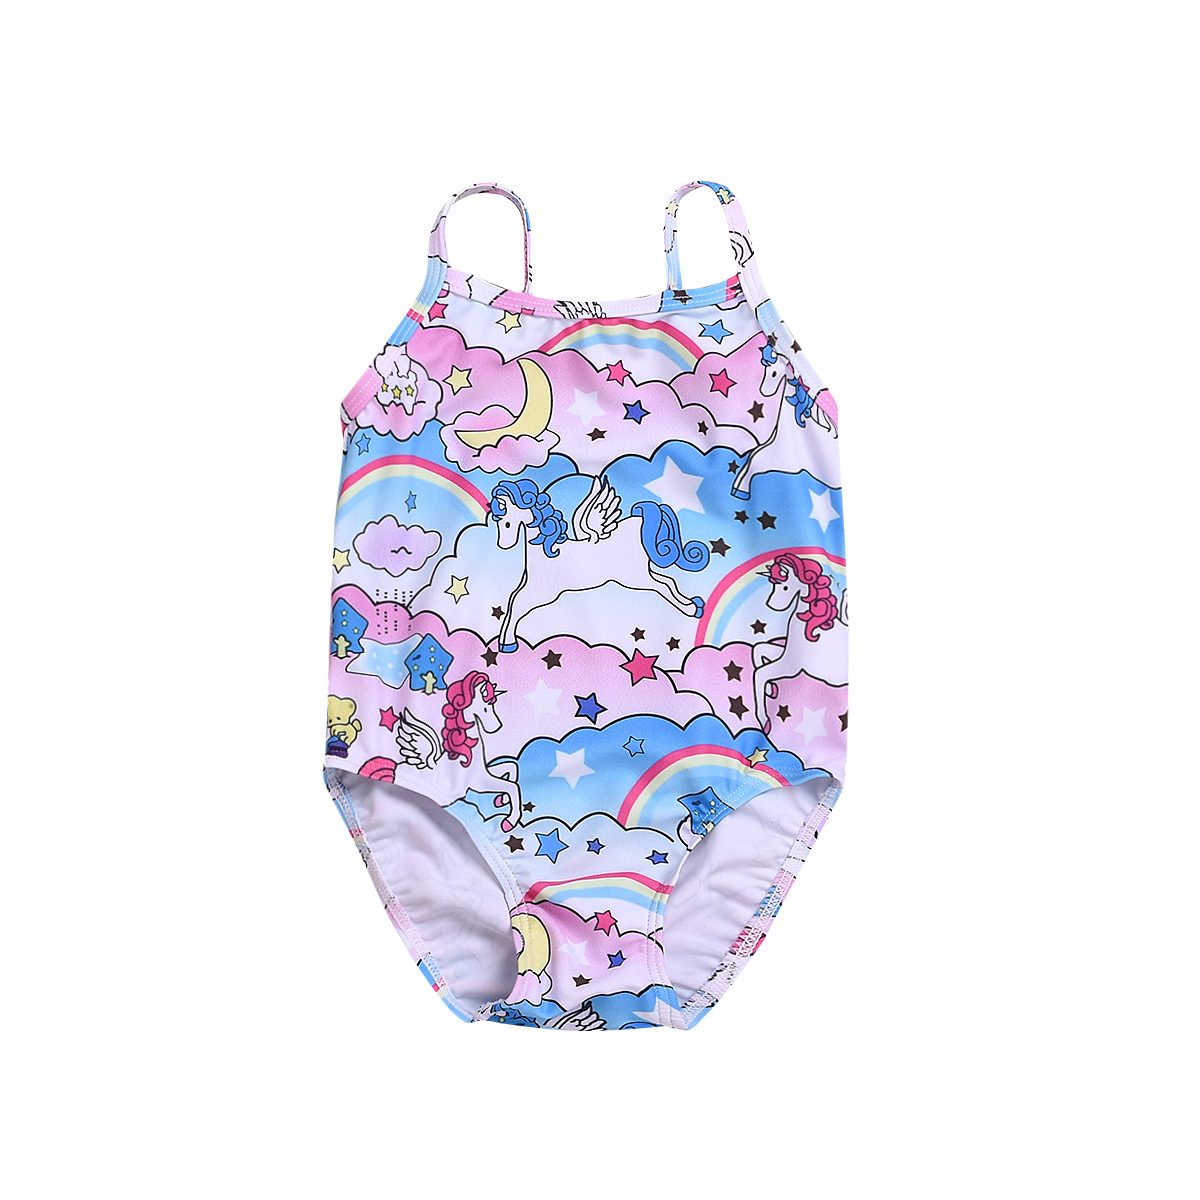 New Products CHILDREN'S Swimwear Girls Unicorn Cartoon Bathing Suit Baby One-piece Swimwear